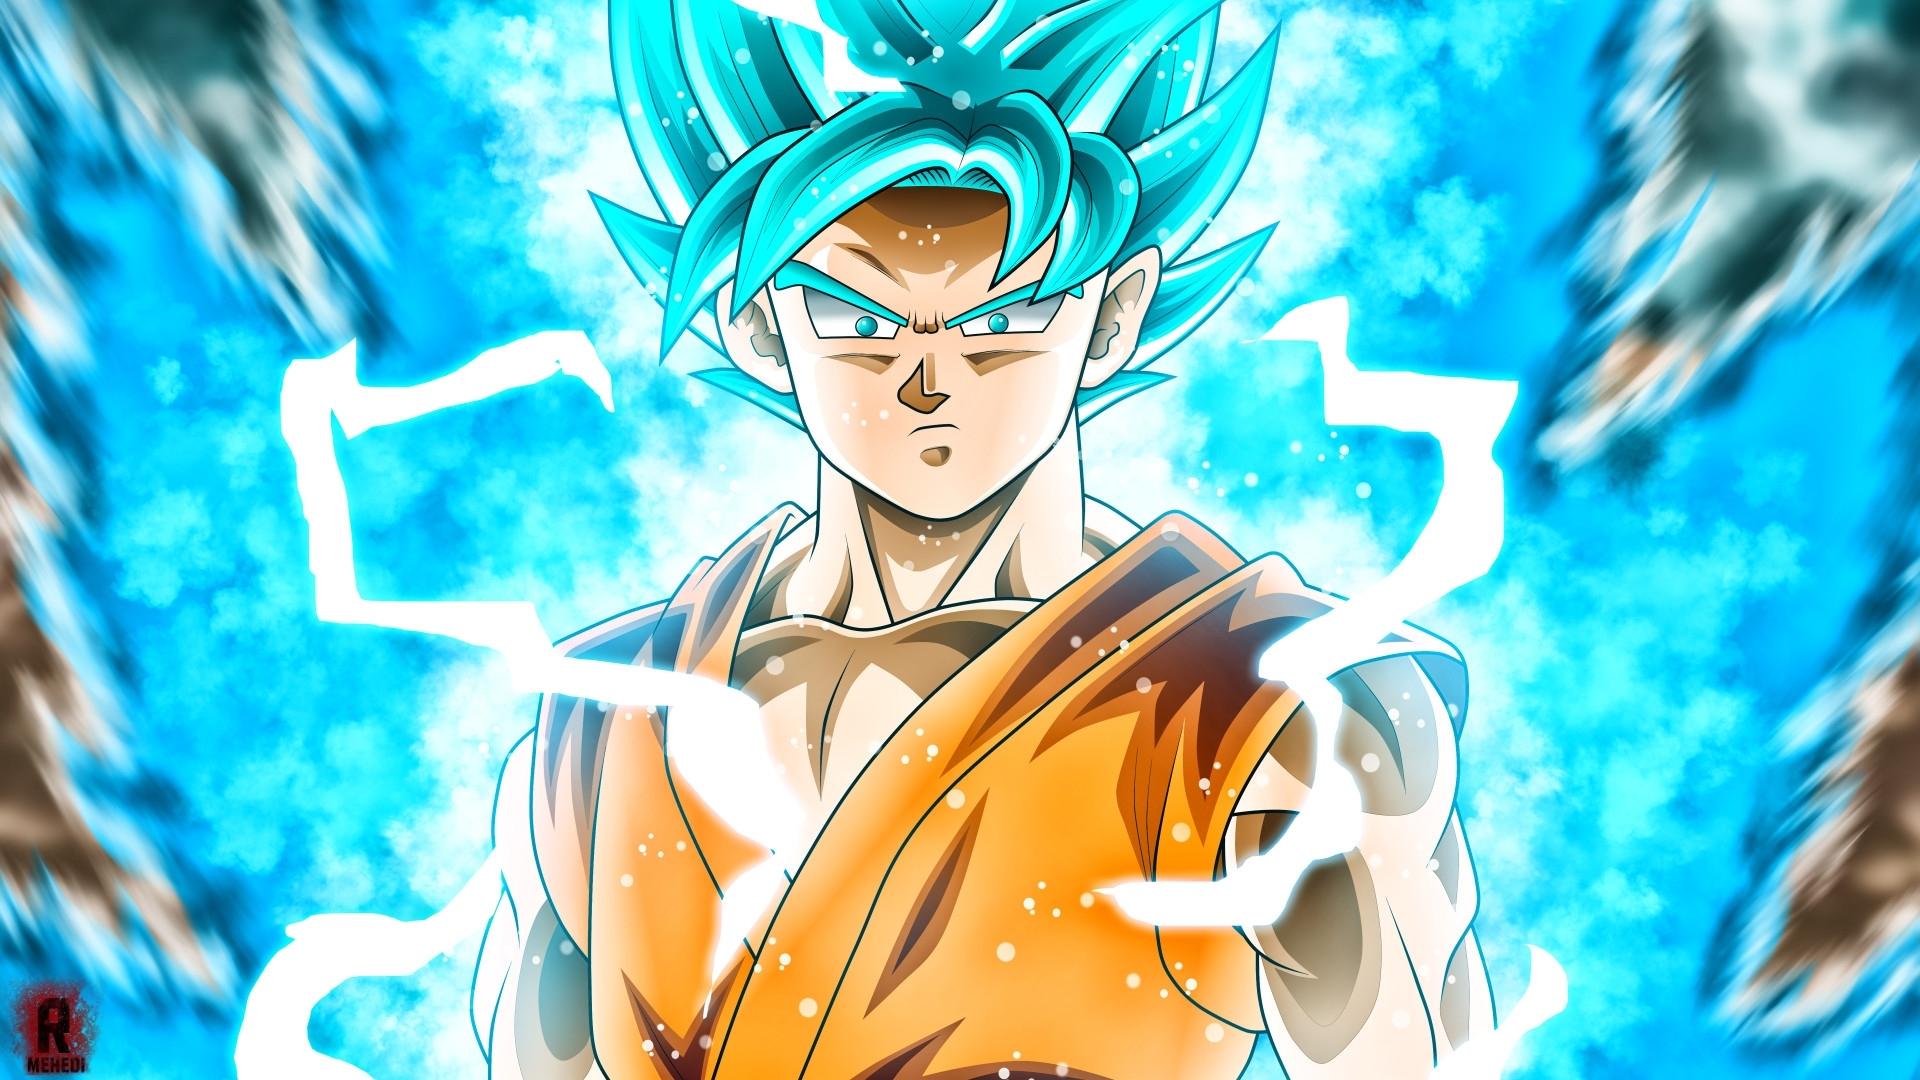 super saiyan god hd wallpaper (71+ images)